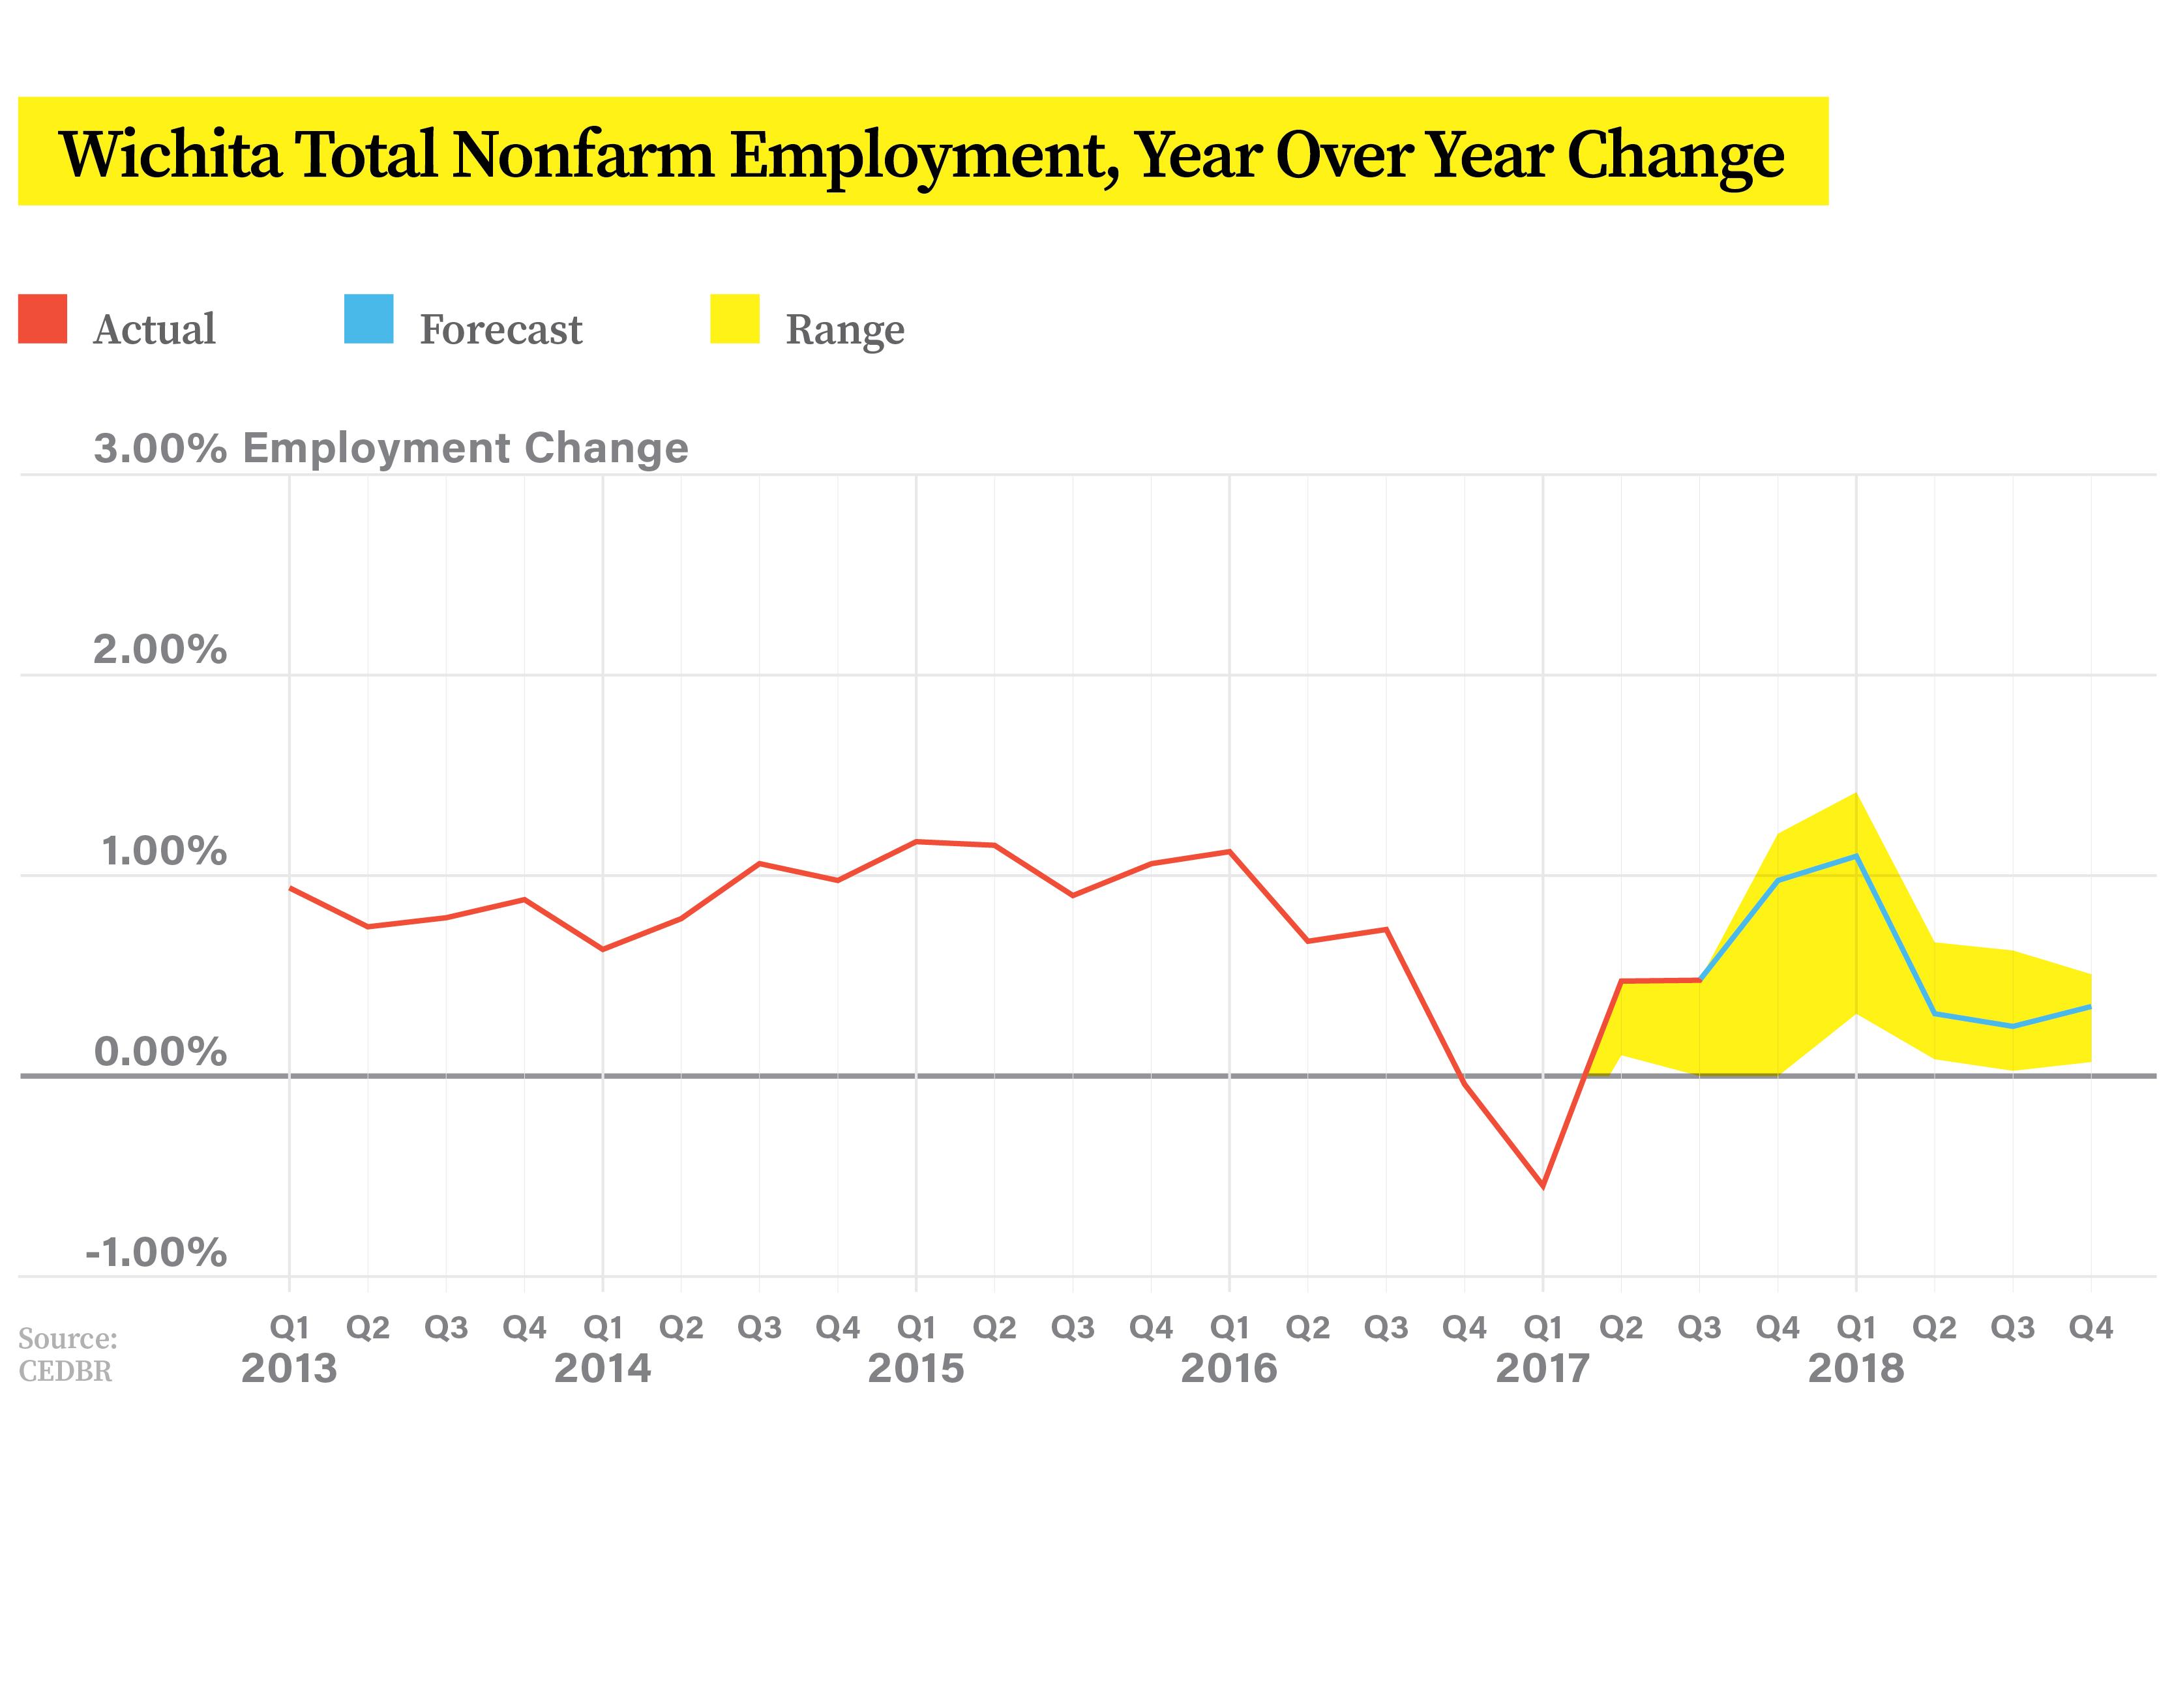 18CNG12907_Chung_NewJobsInfographics_v3-6_TotalNonfarmEmployment